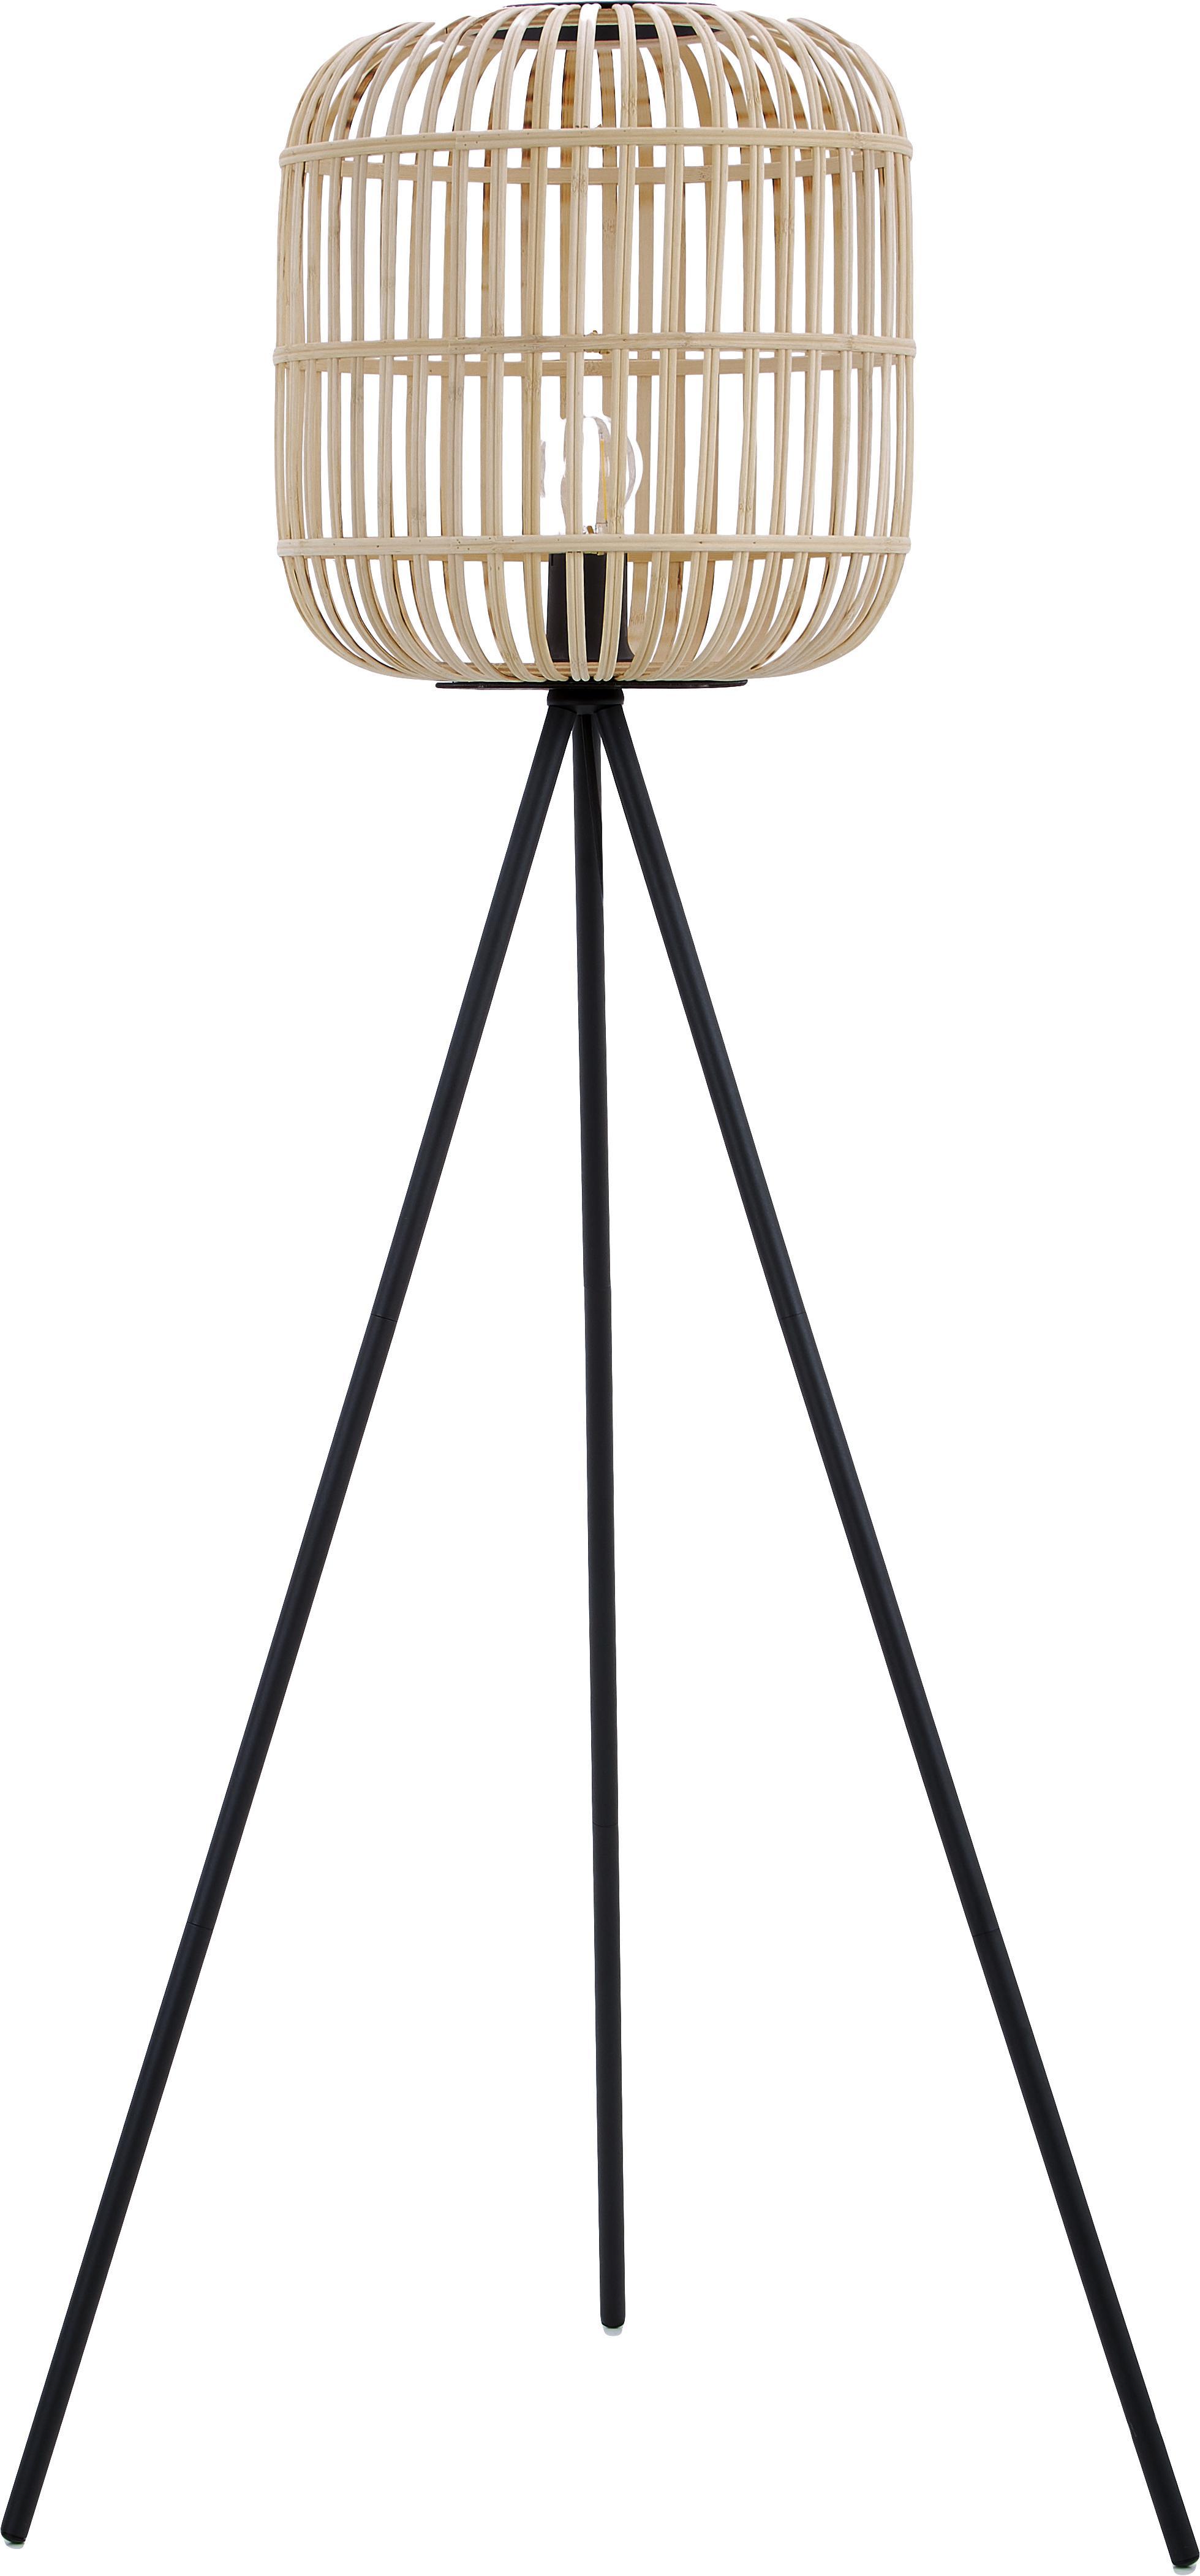 Lampada da terra Bordesley, Acciaio, legno, Nero, legno, Ø 35 x Alt. 139 cm